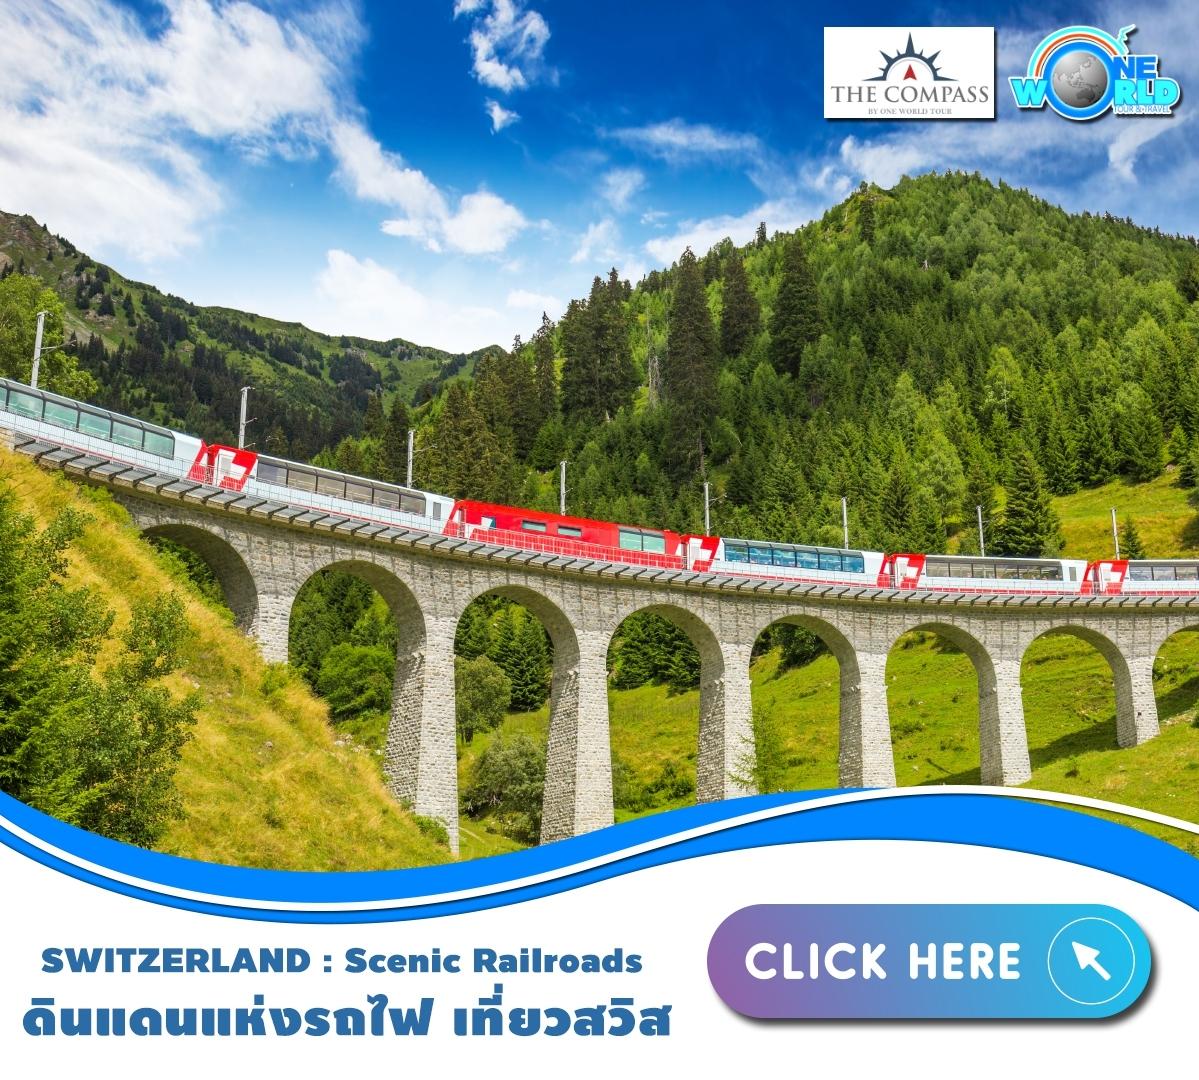 SWITZERLAND: Scenic Railroads ดินแดนแห่งรถไฟ เที่ยวสวิส By THE COMPASS ONE WORLD TOUR AND TRAVEL